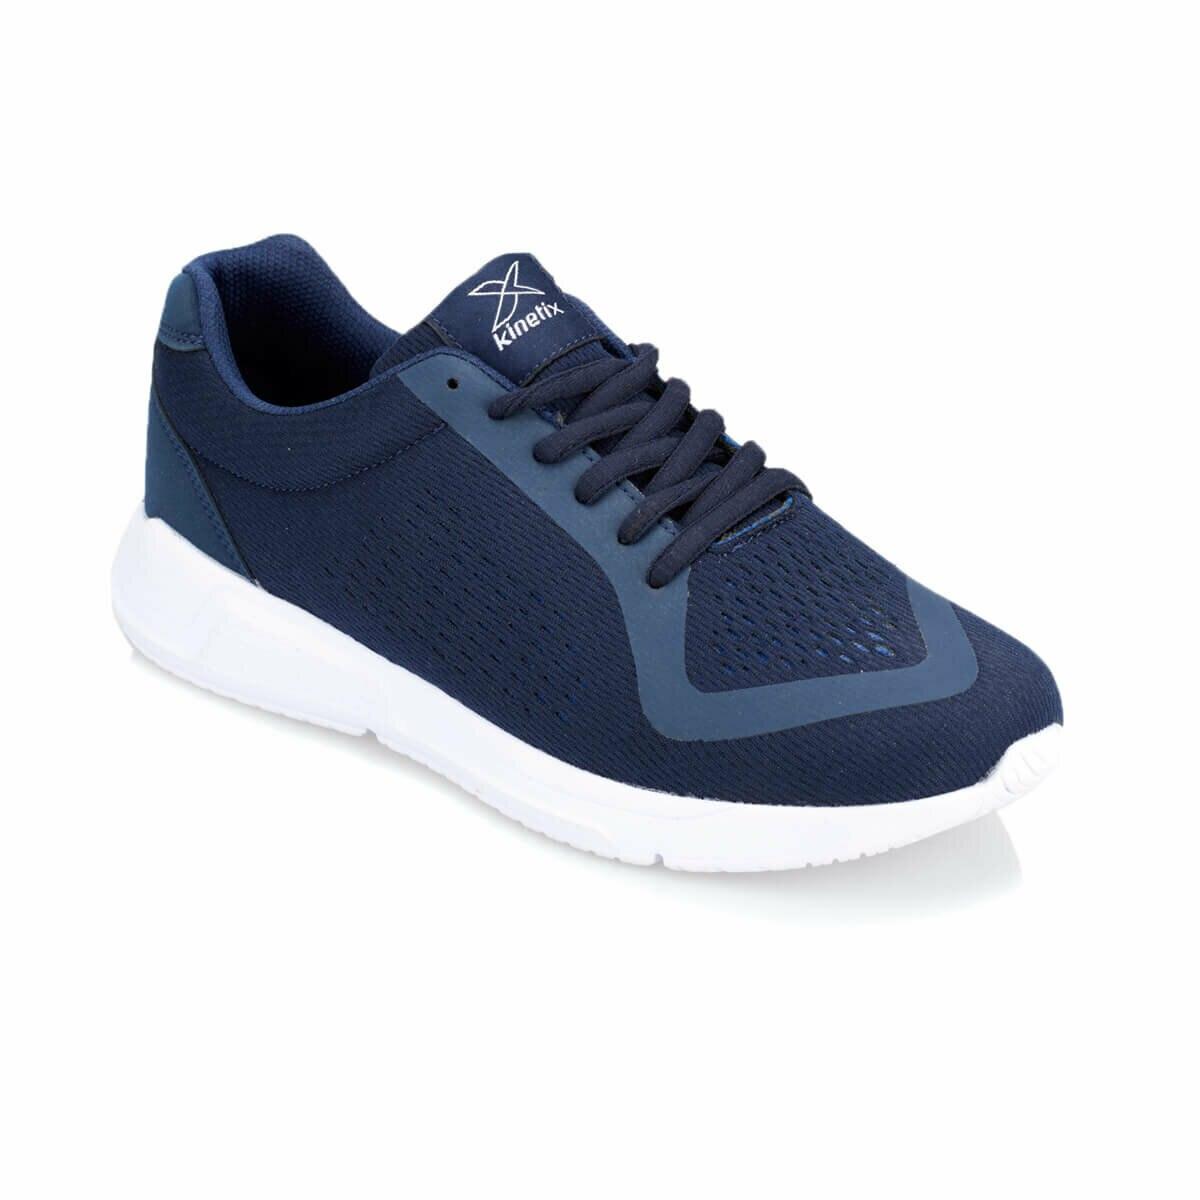 FLO REX M Navy Blue Men 'S Sneaker Shoes KINETIX